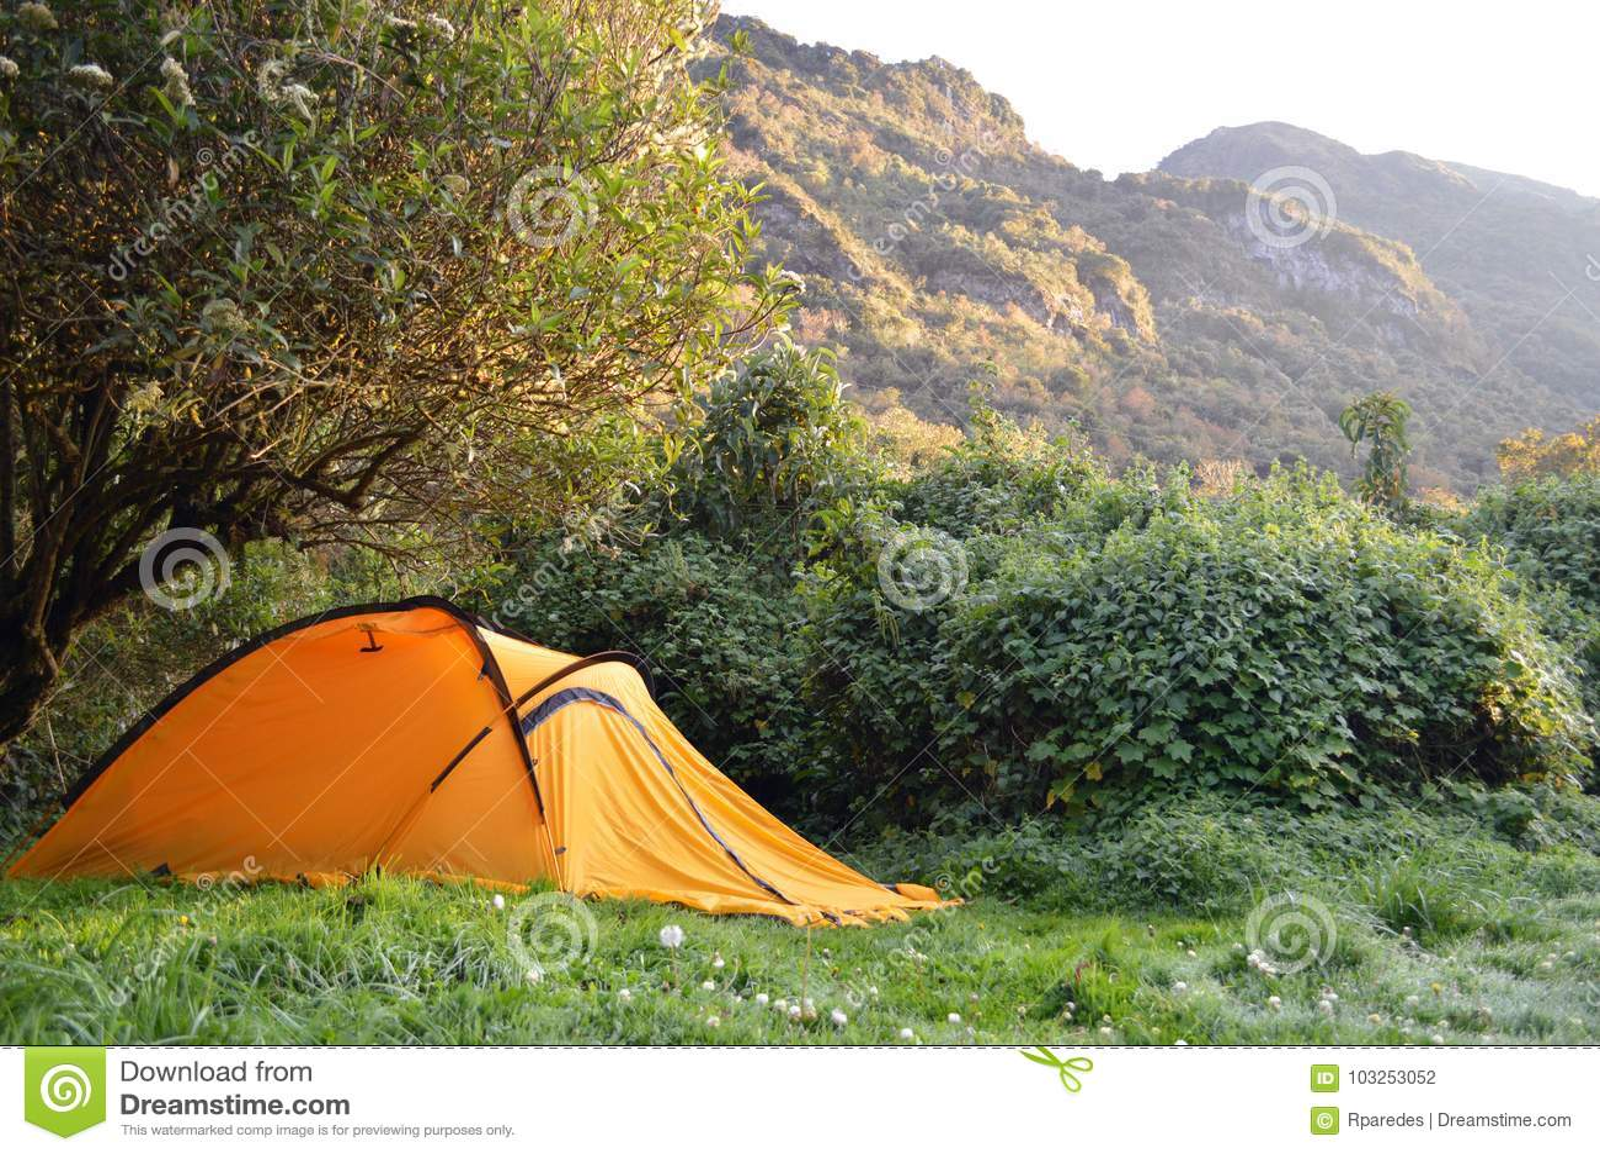 geen hook up Camping betekent glorie 15 matchmaking